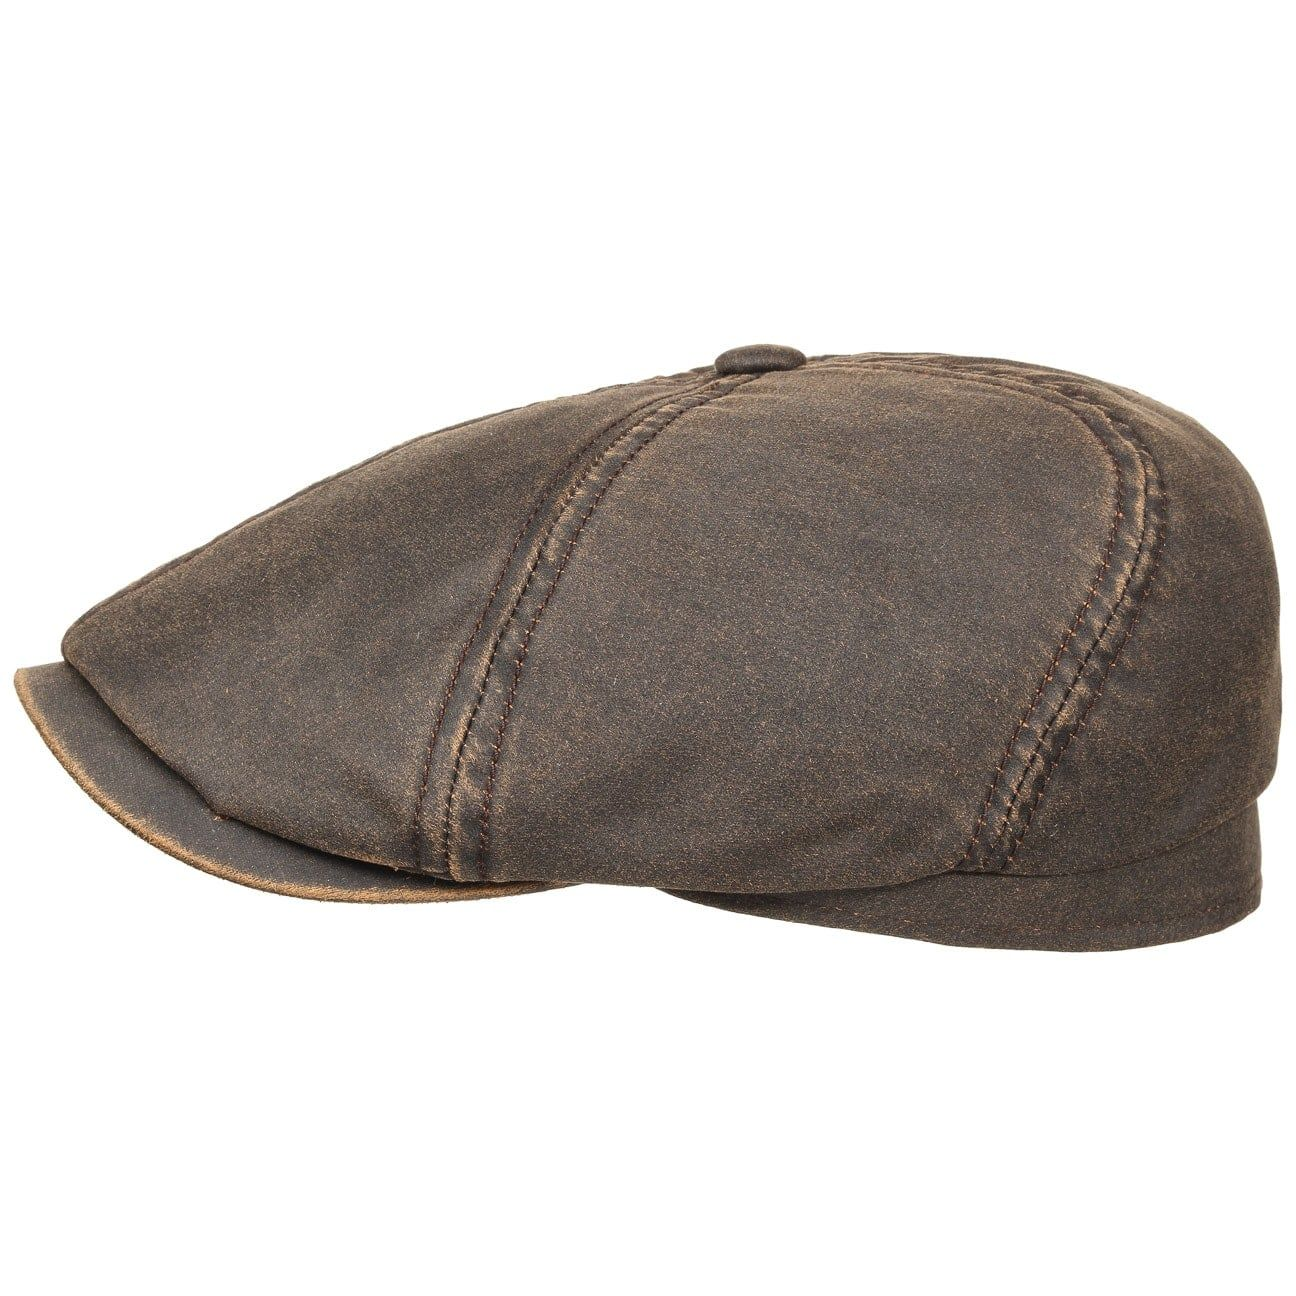 Brooklin Old Cotton Flat Cap brown